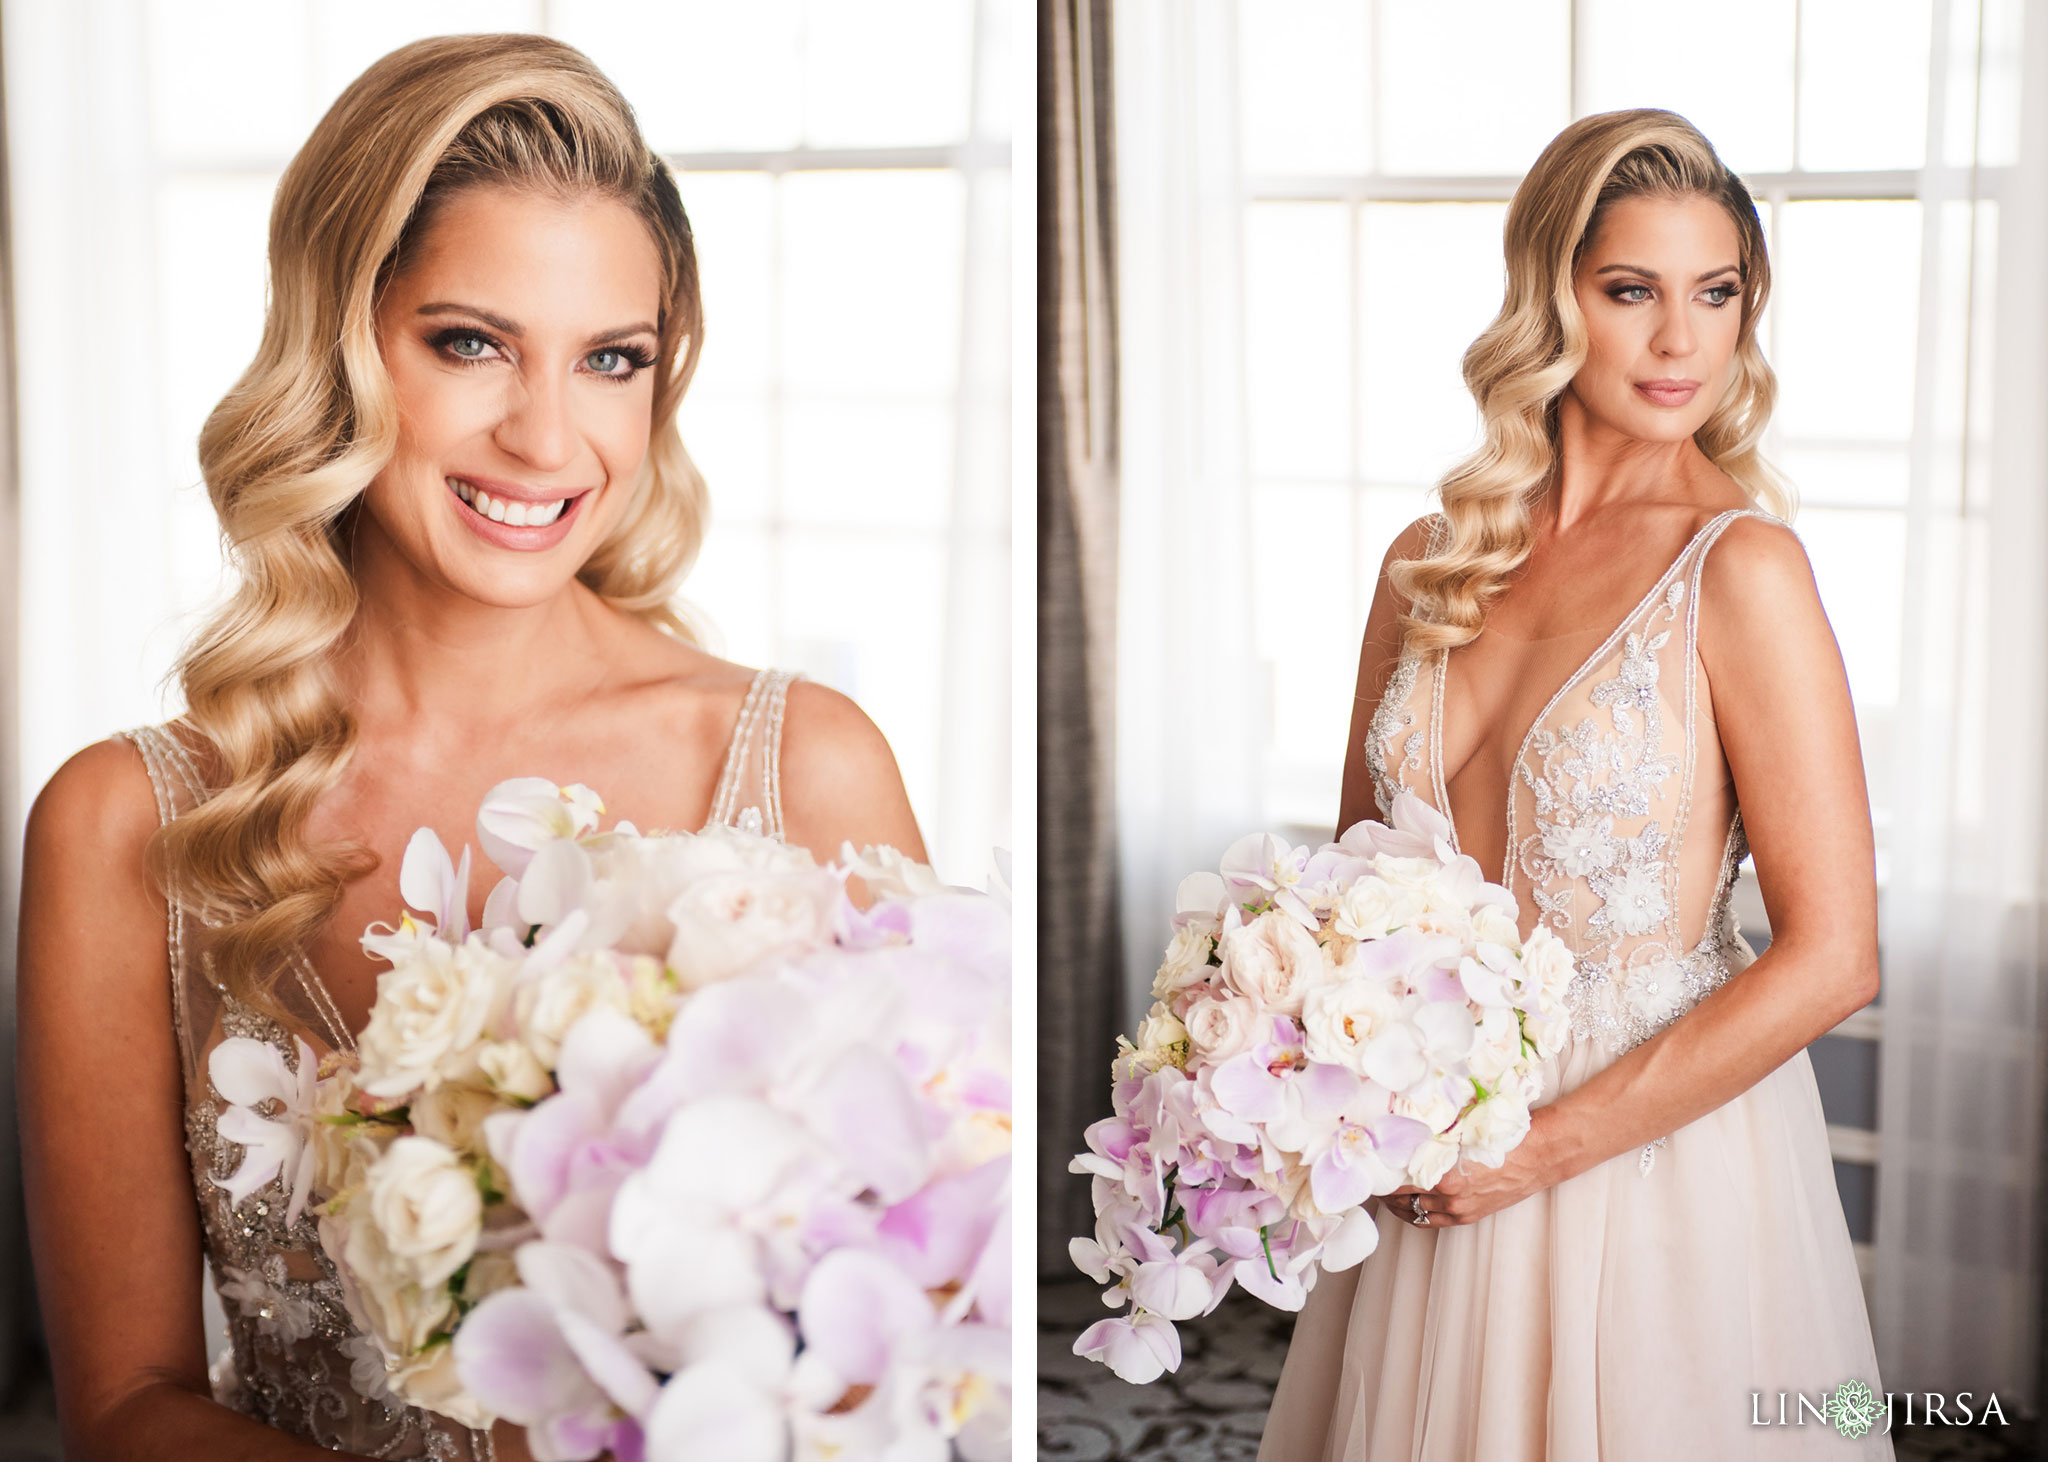 005 millennium biltmore hotel los angeles wedding photography